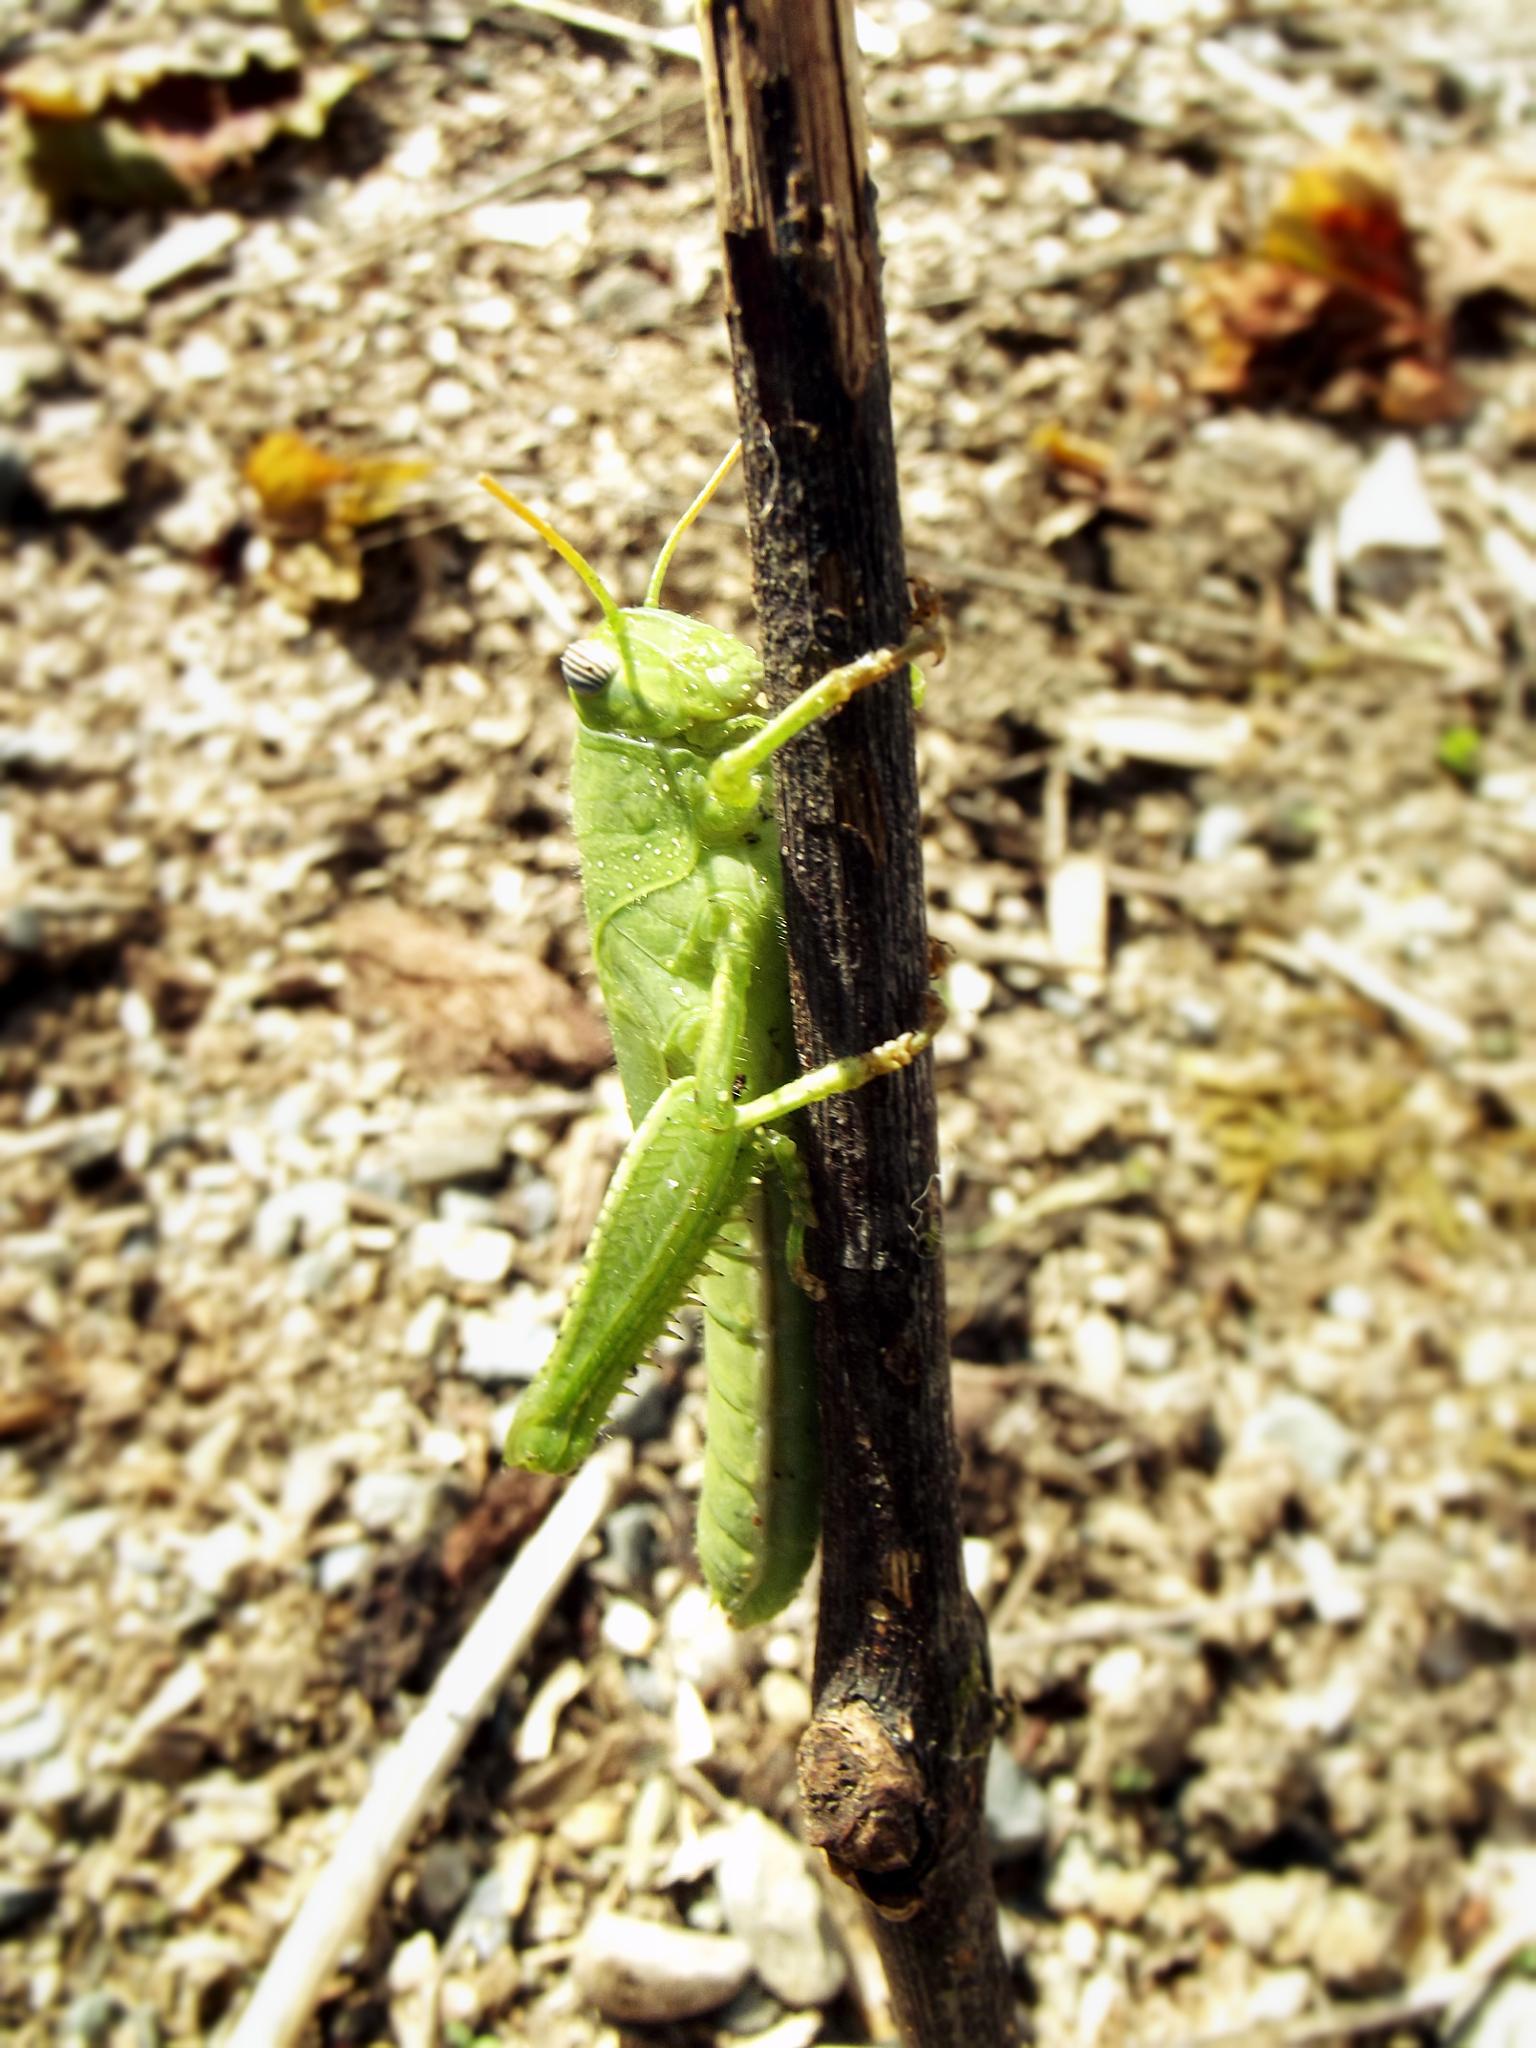 Grasshopper by my17ida